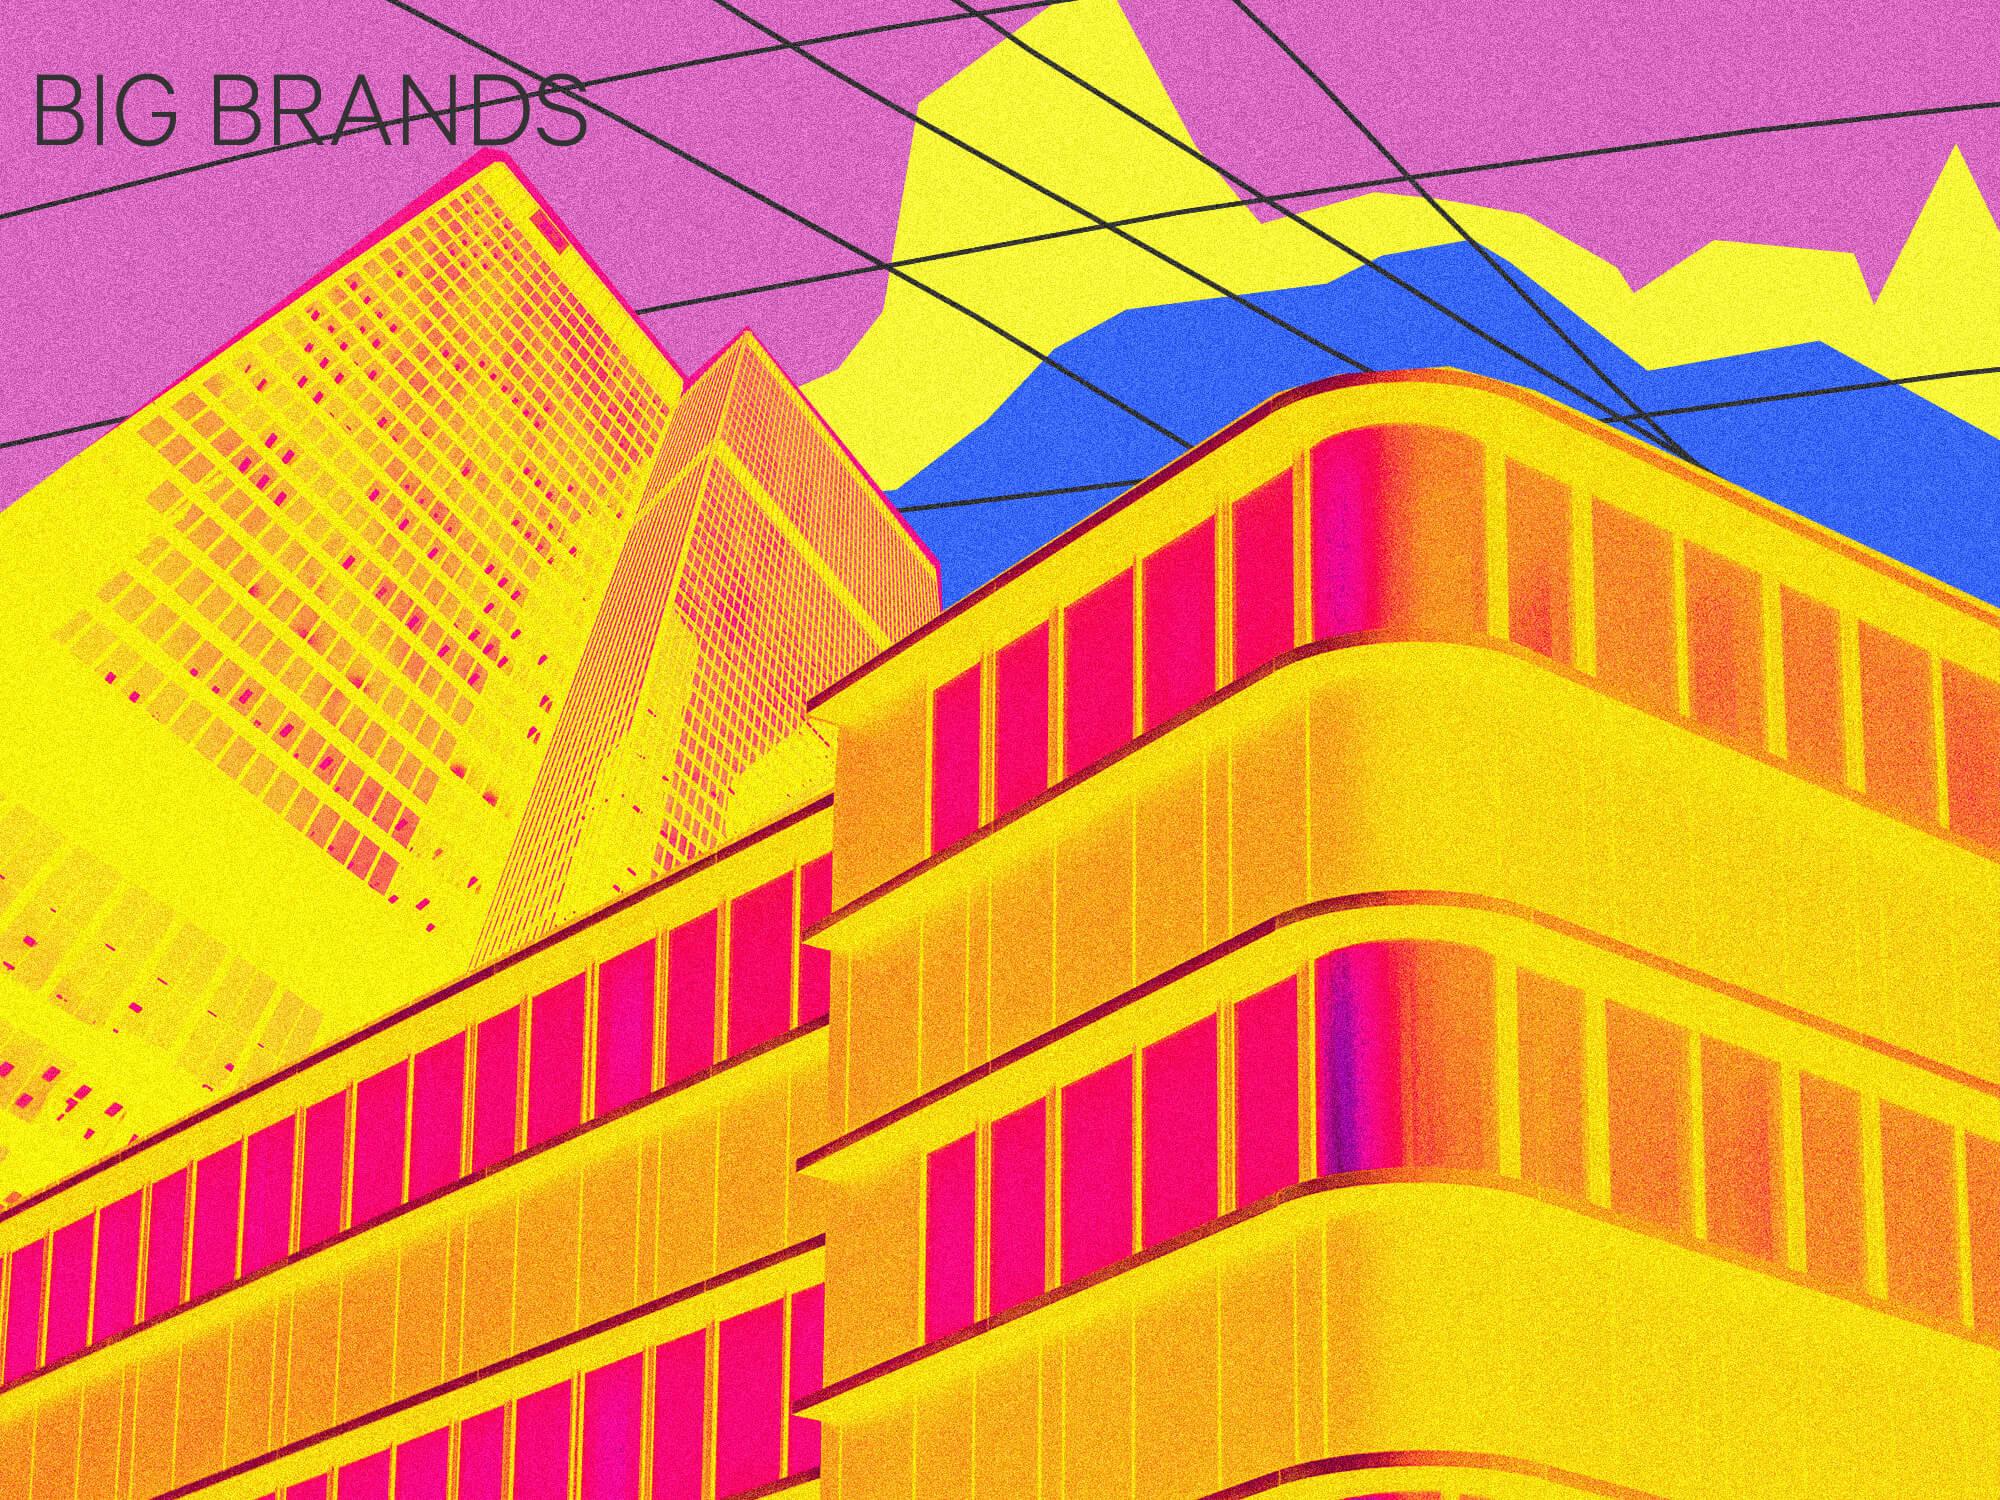 Get More Freelance Clients Using Social Media - Big Brands